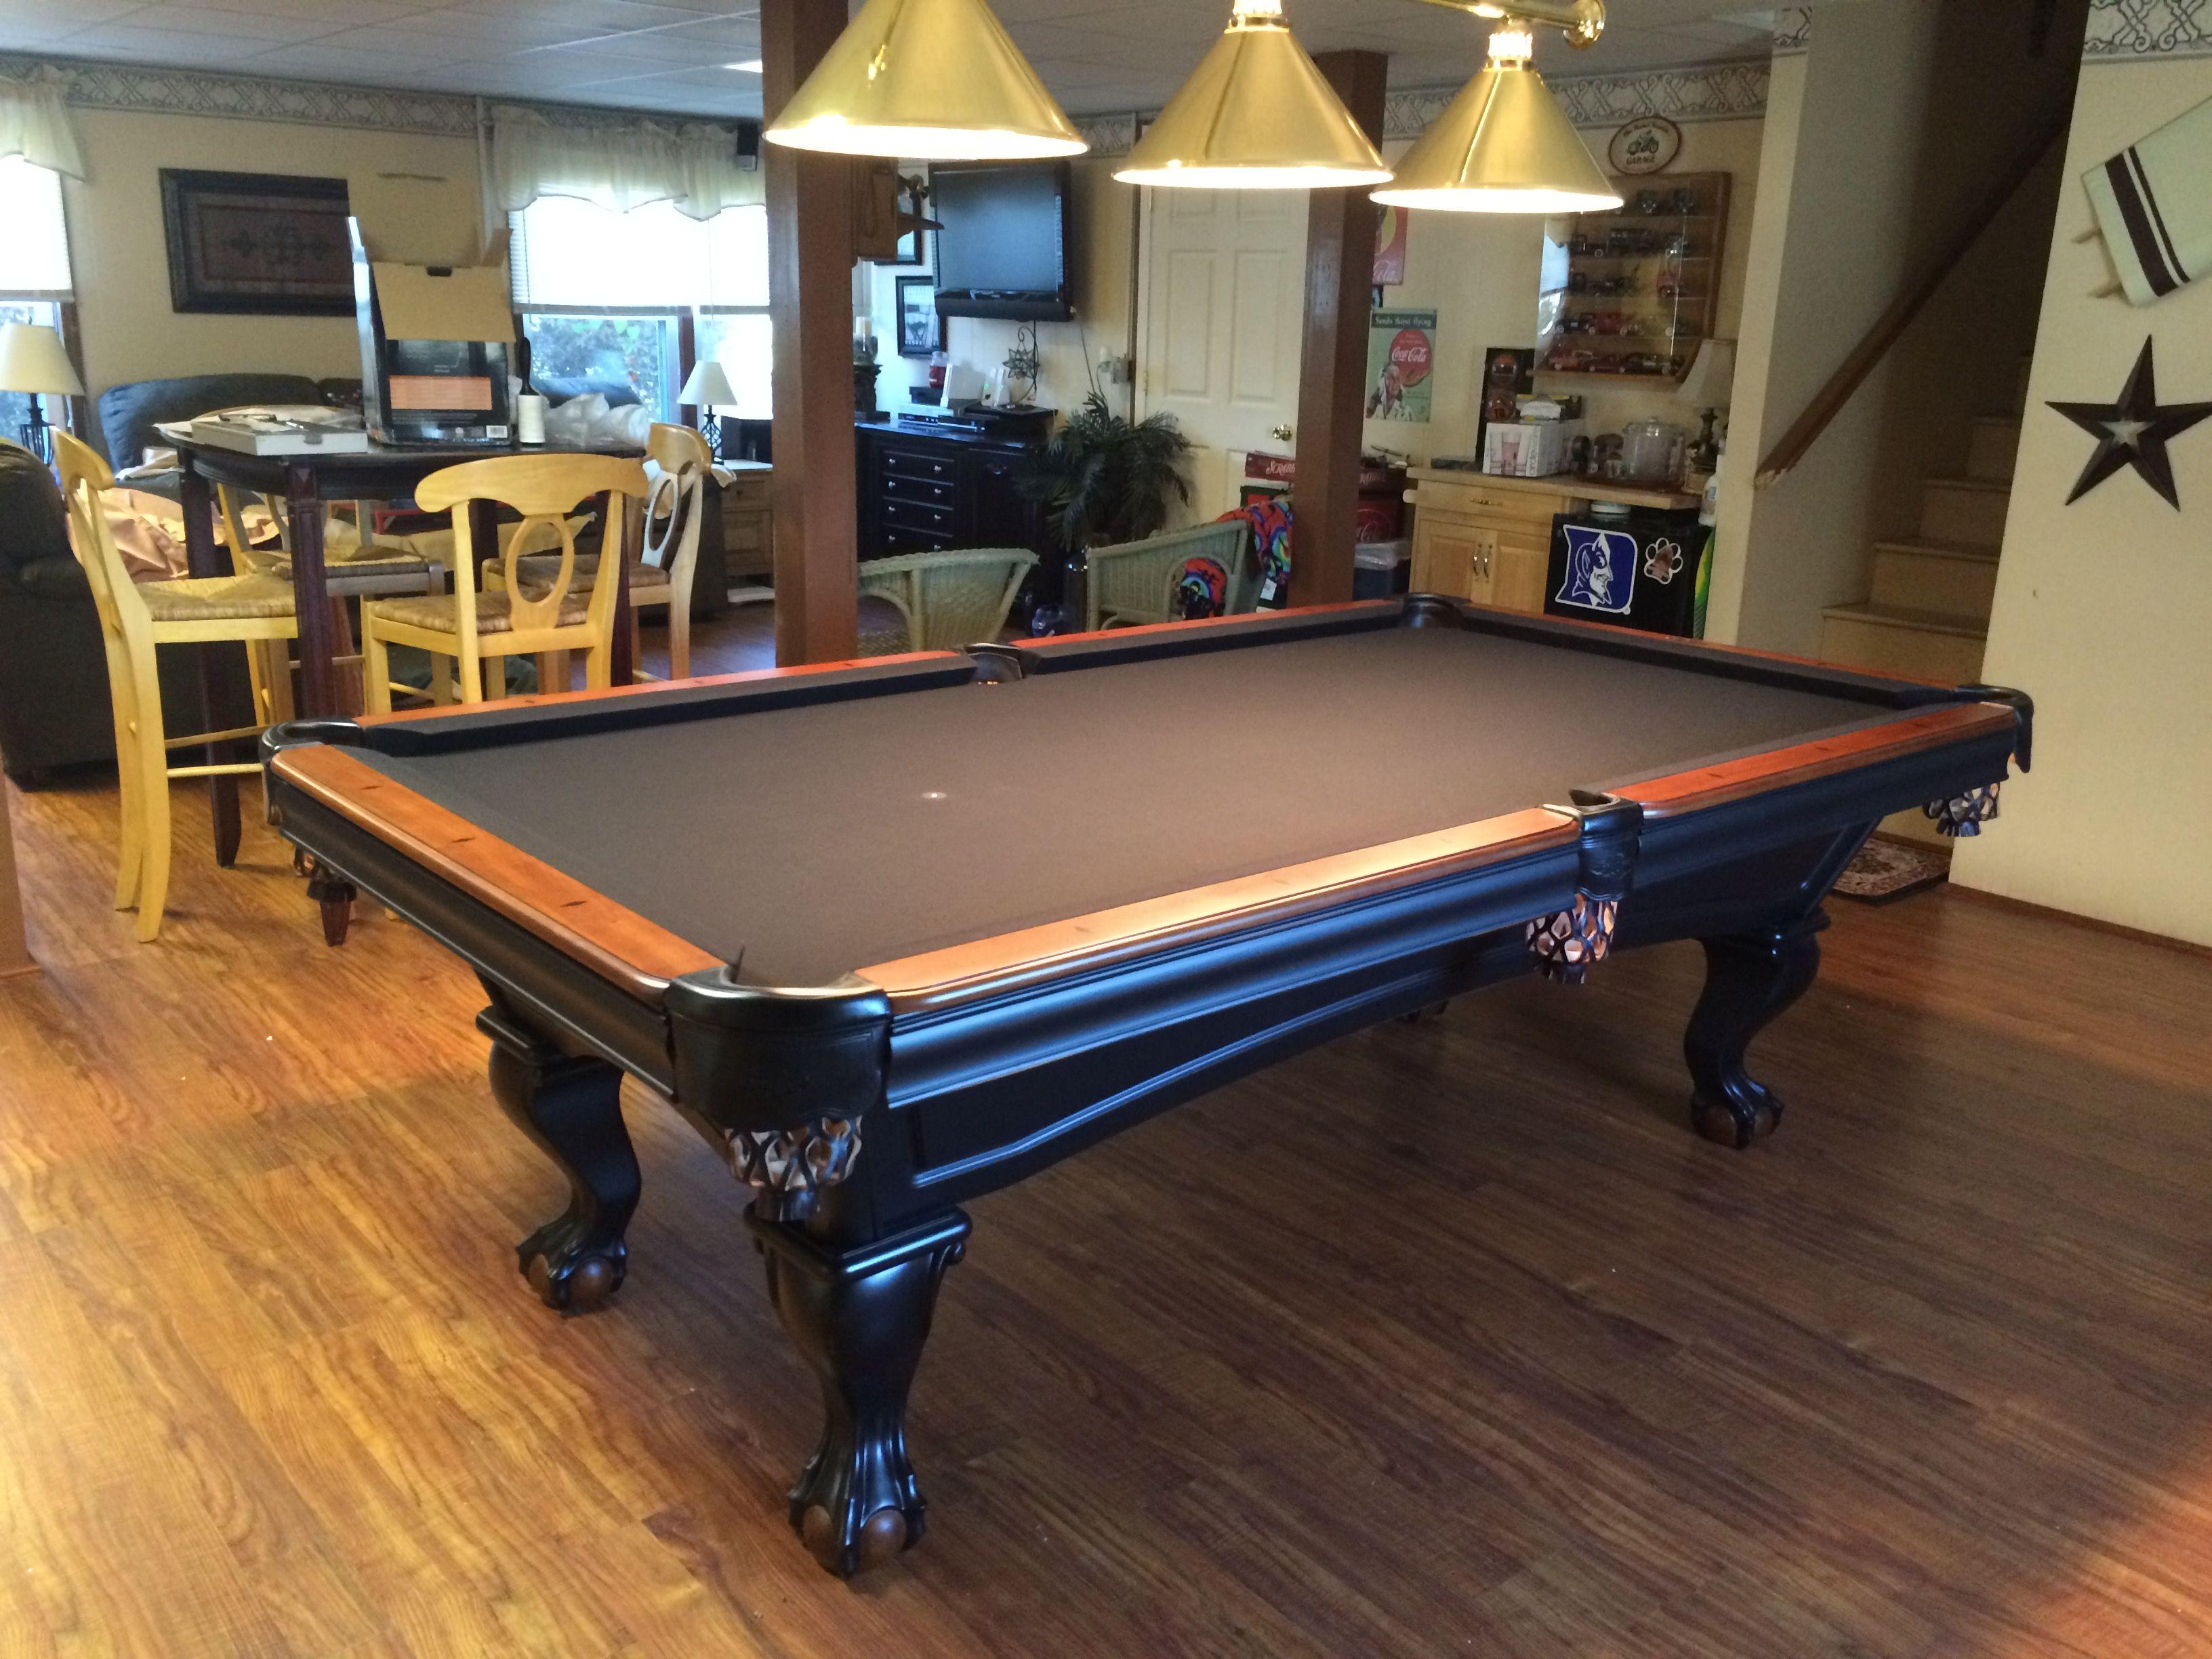 Brunswick Glenwood Tone Pool Table Httpeverythingbilliardsnet - Brunswick glenwood pool table